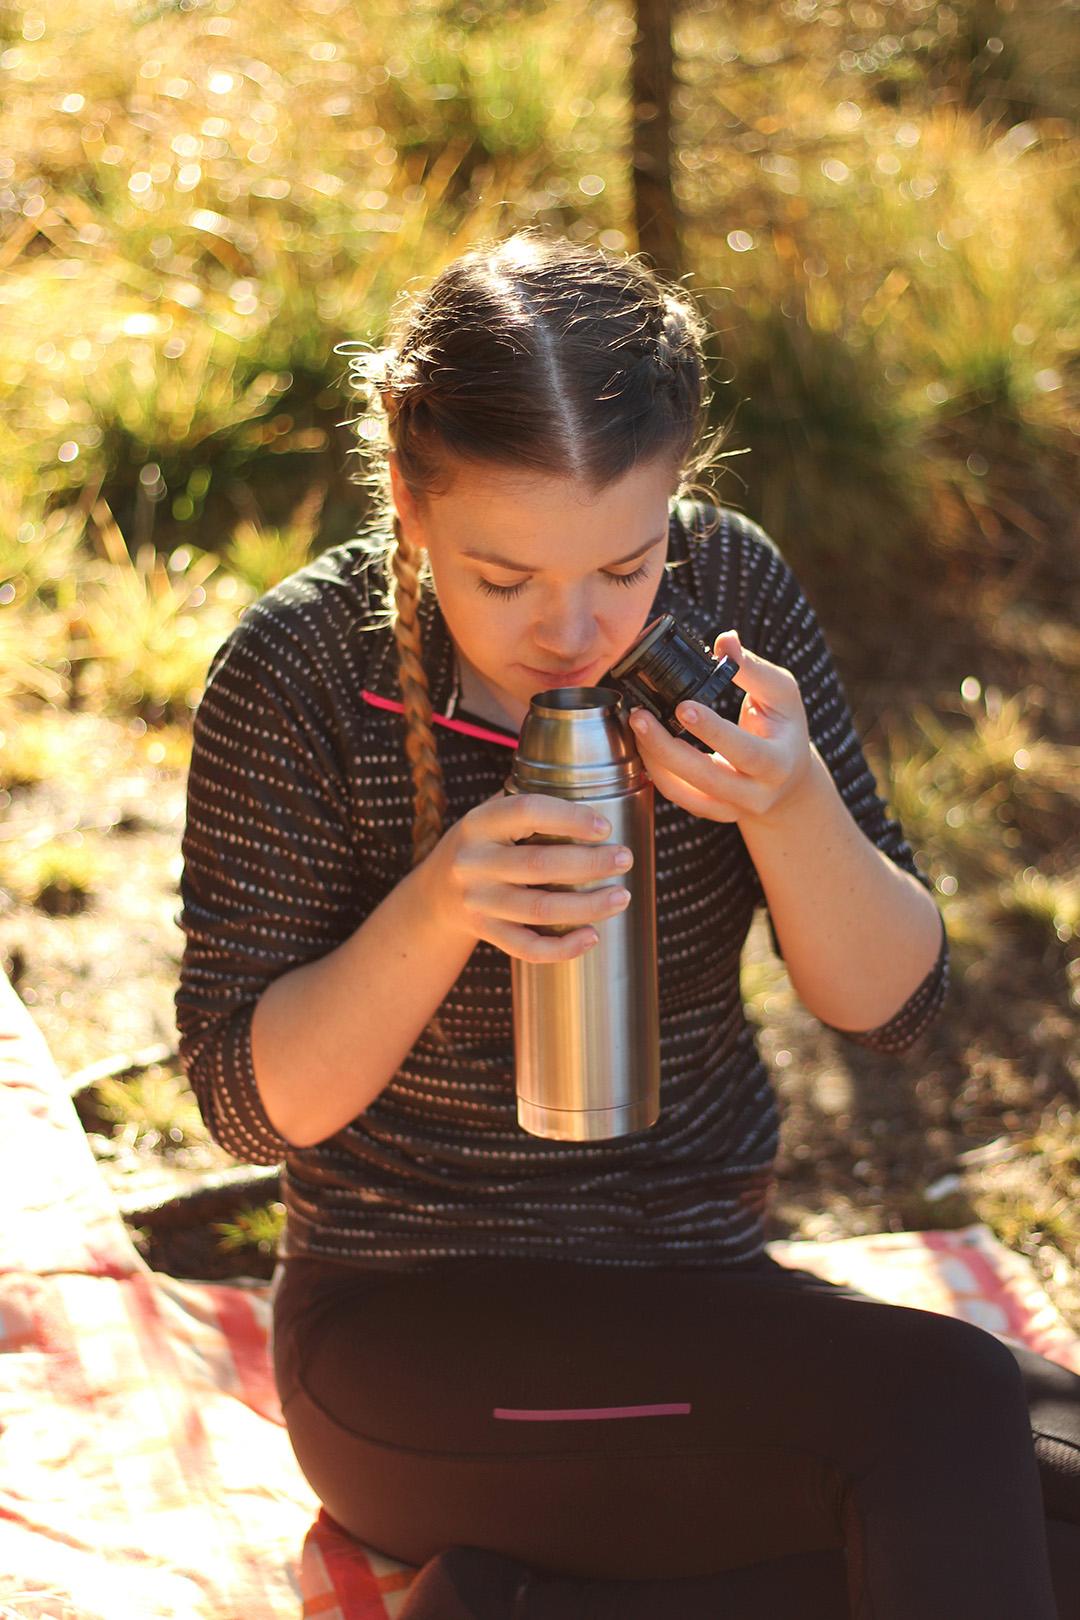 Picknick am Ingerringsee, Öffnen vom Kaffee